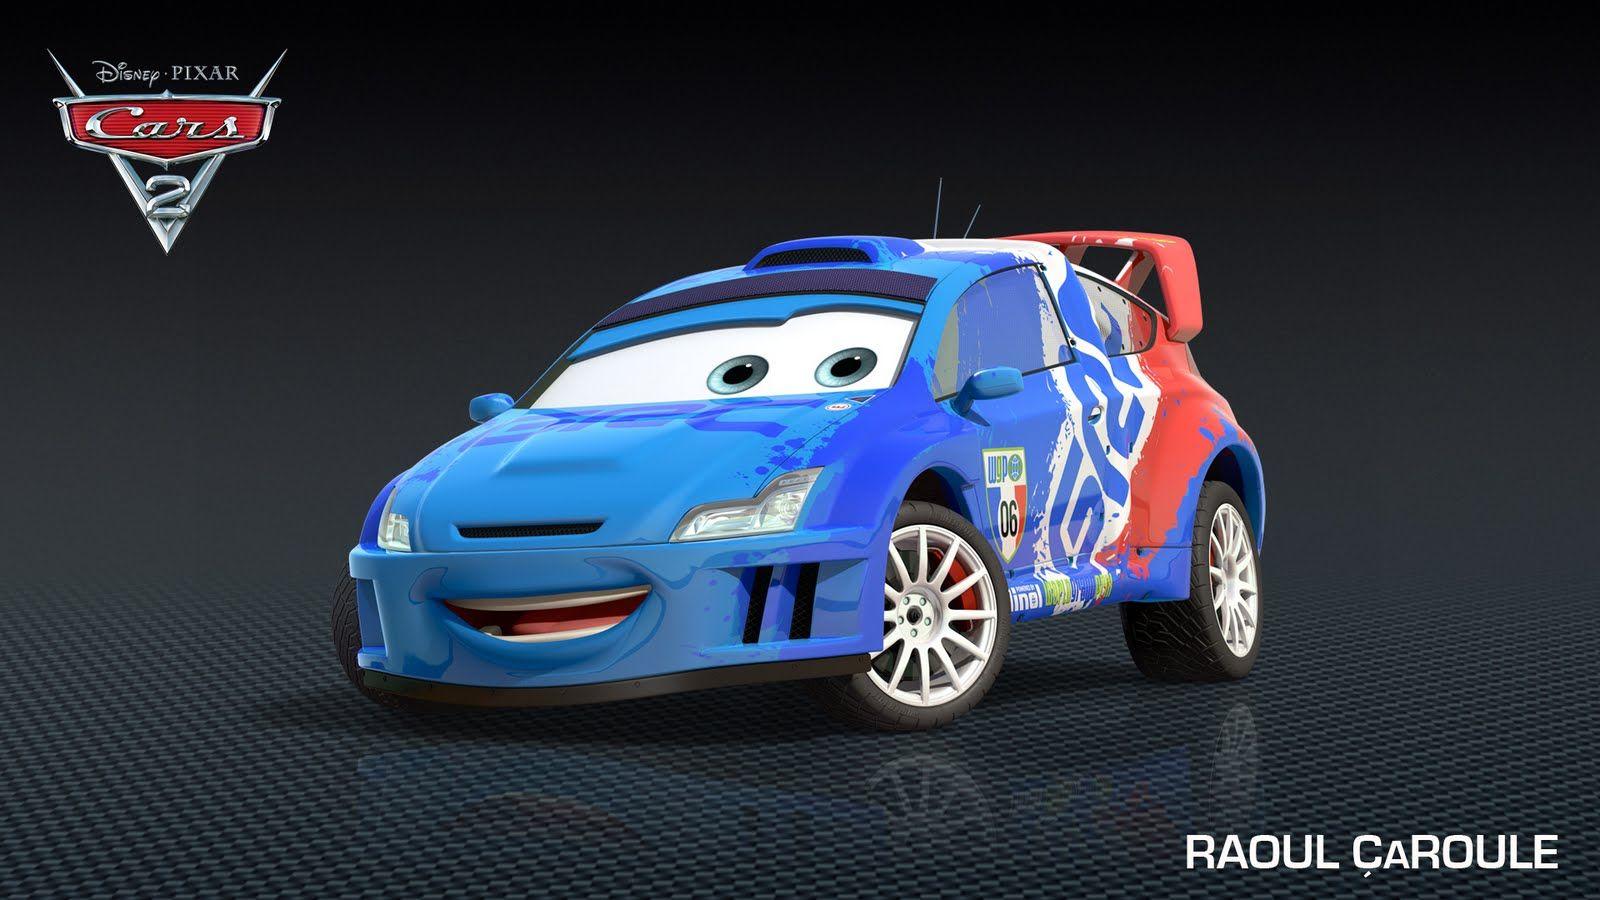 New Cars 2 Character Raoul Caroule Makkuin Tachka